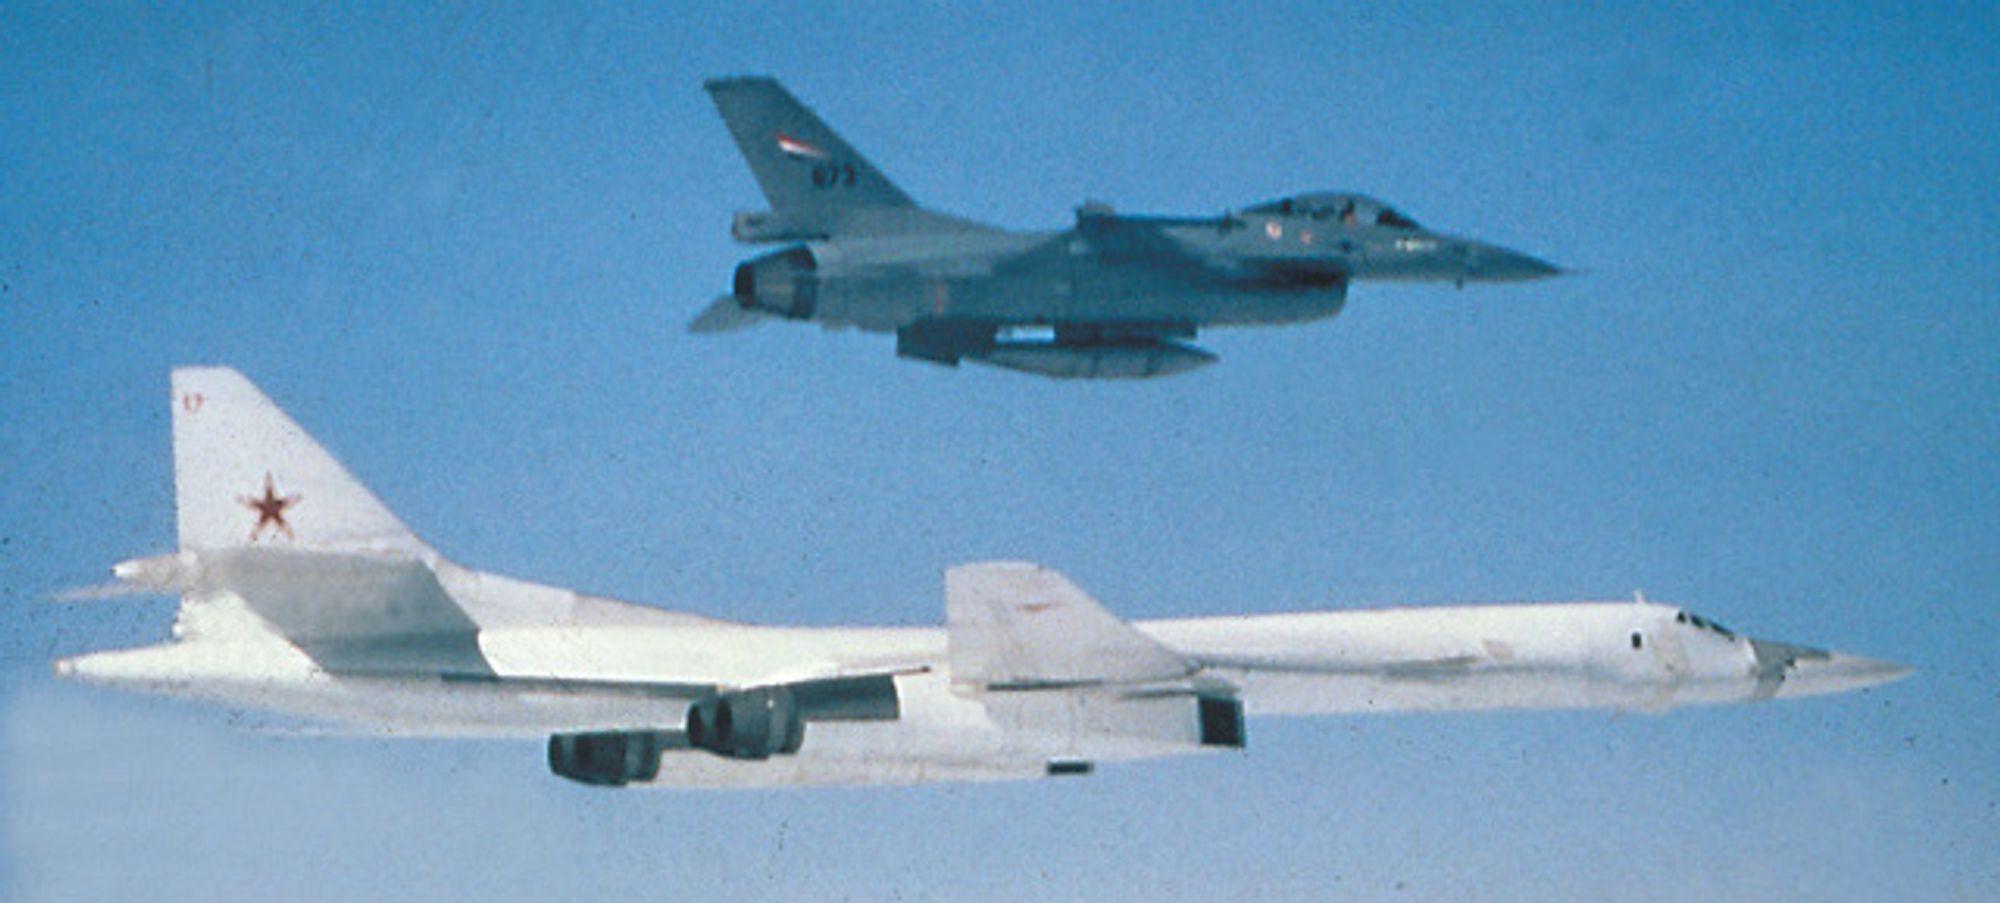 Norsk F-16 og russisk Tu-160 i 2002. Perspektivet lyver litt om størrelsen: F-16 er 15 meter lang, mens Tu-160 er 54 meter.